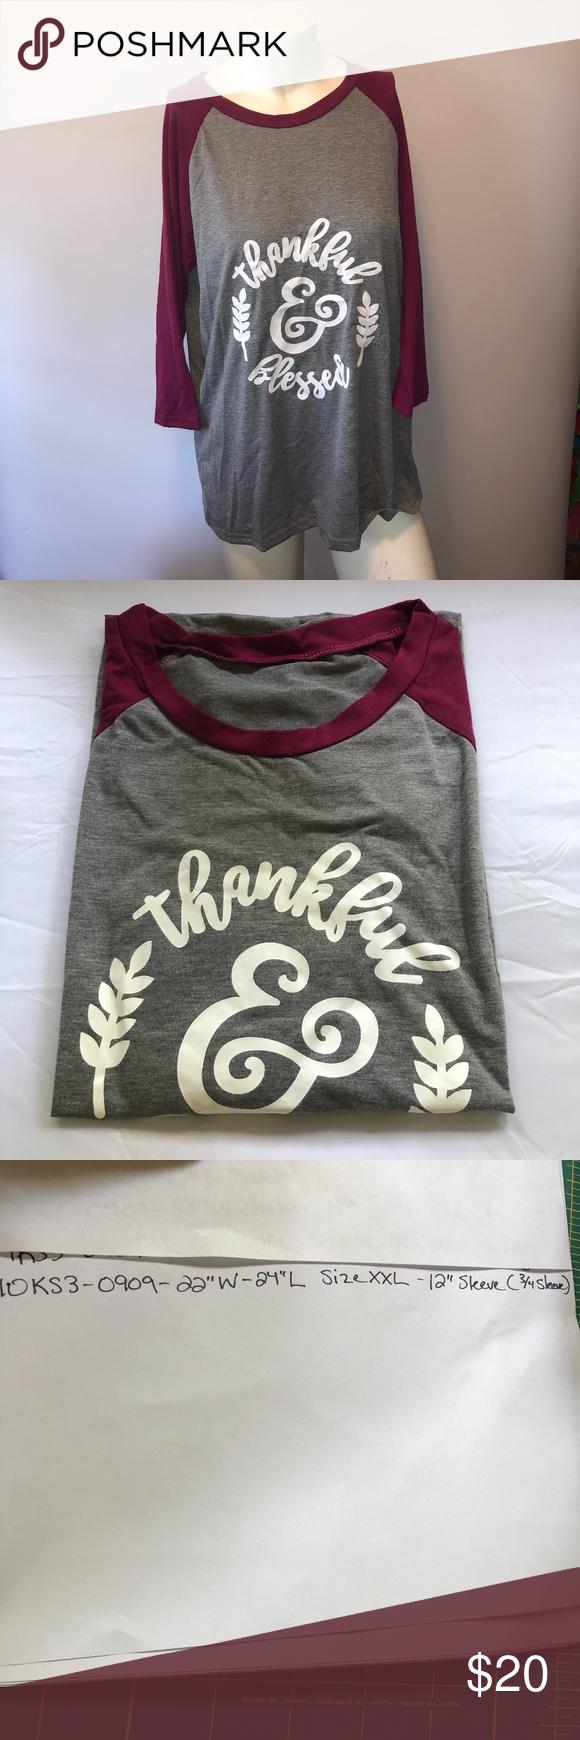 Thankful & Blessed Raglan Sleeve Graphic Tee XXL Thankful & Blessed Raglan Sleeve Graphic Tee   Gray Maroon   Womens Sz XXL  Length - 24